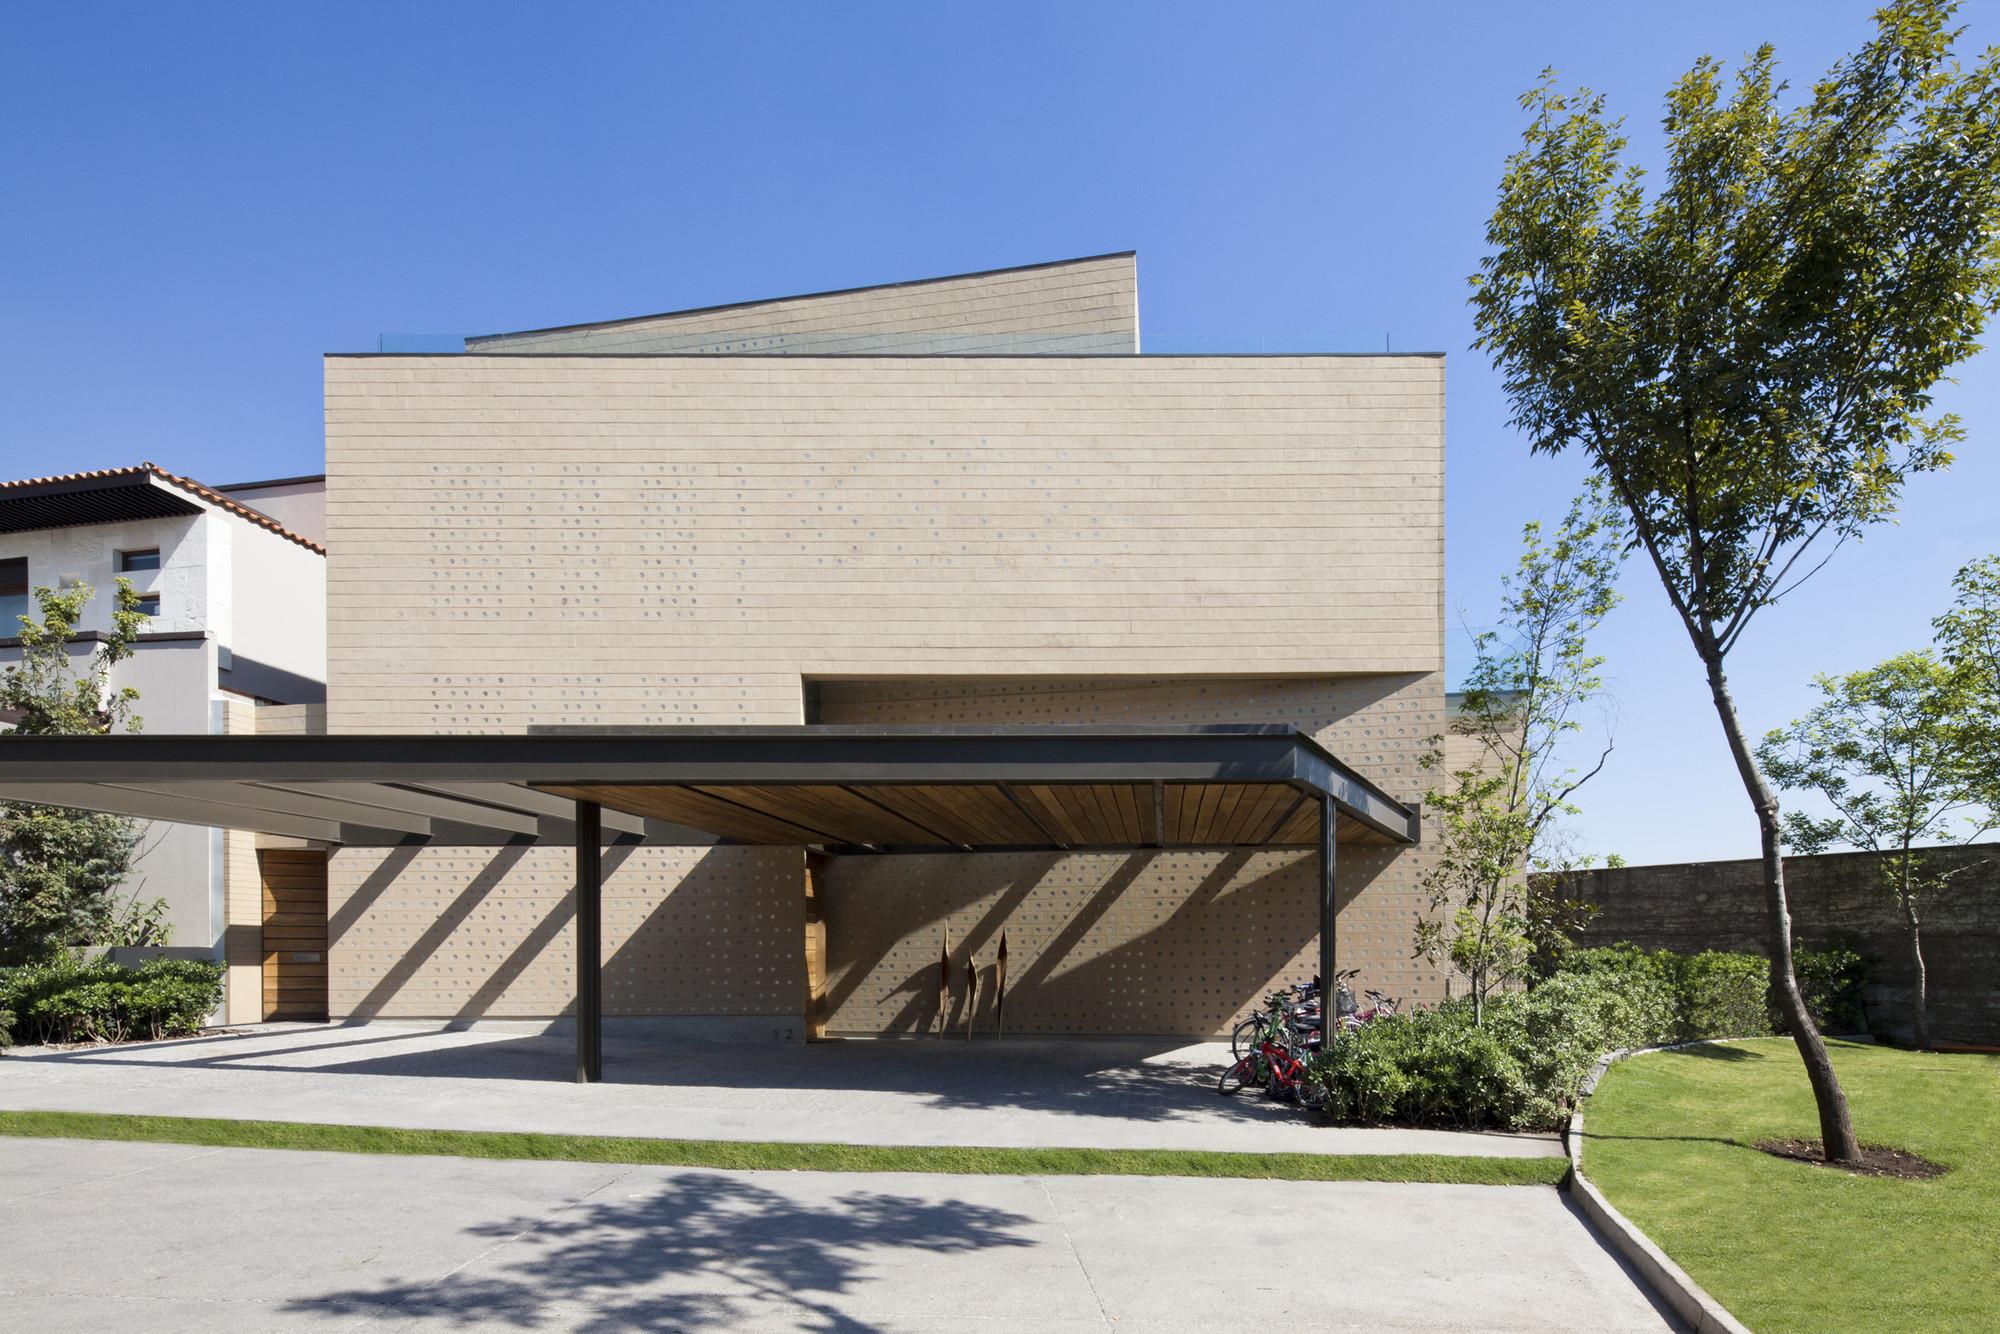 Galeria de casa tierra serrano monjaraz arquitectos 1 for Casa de arquitectos